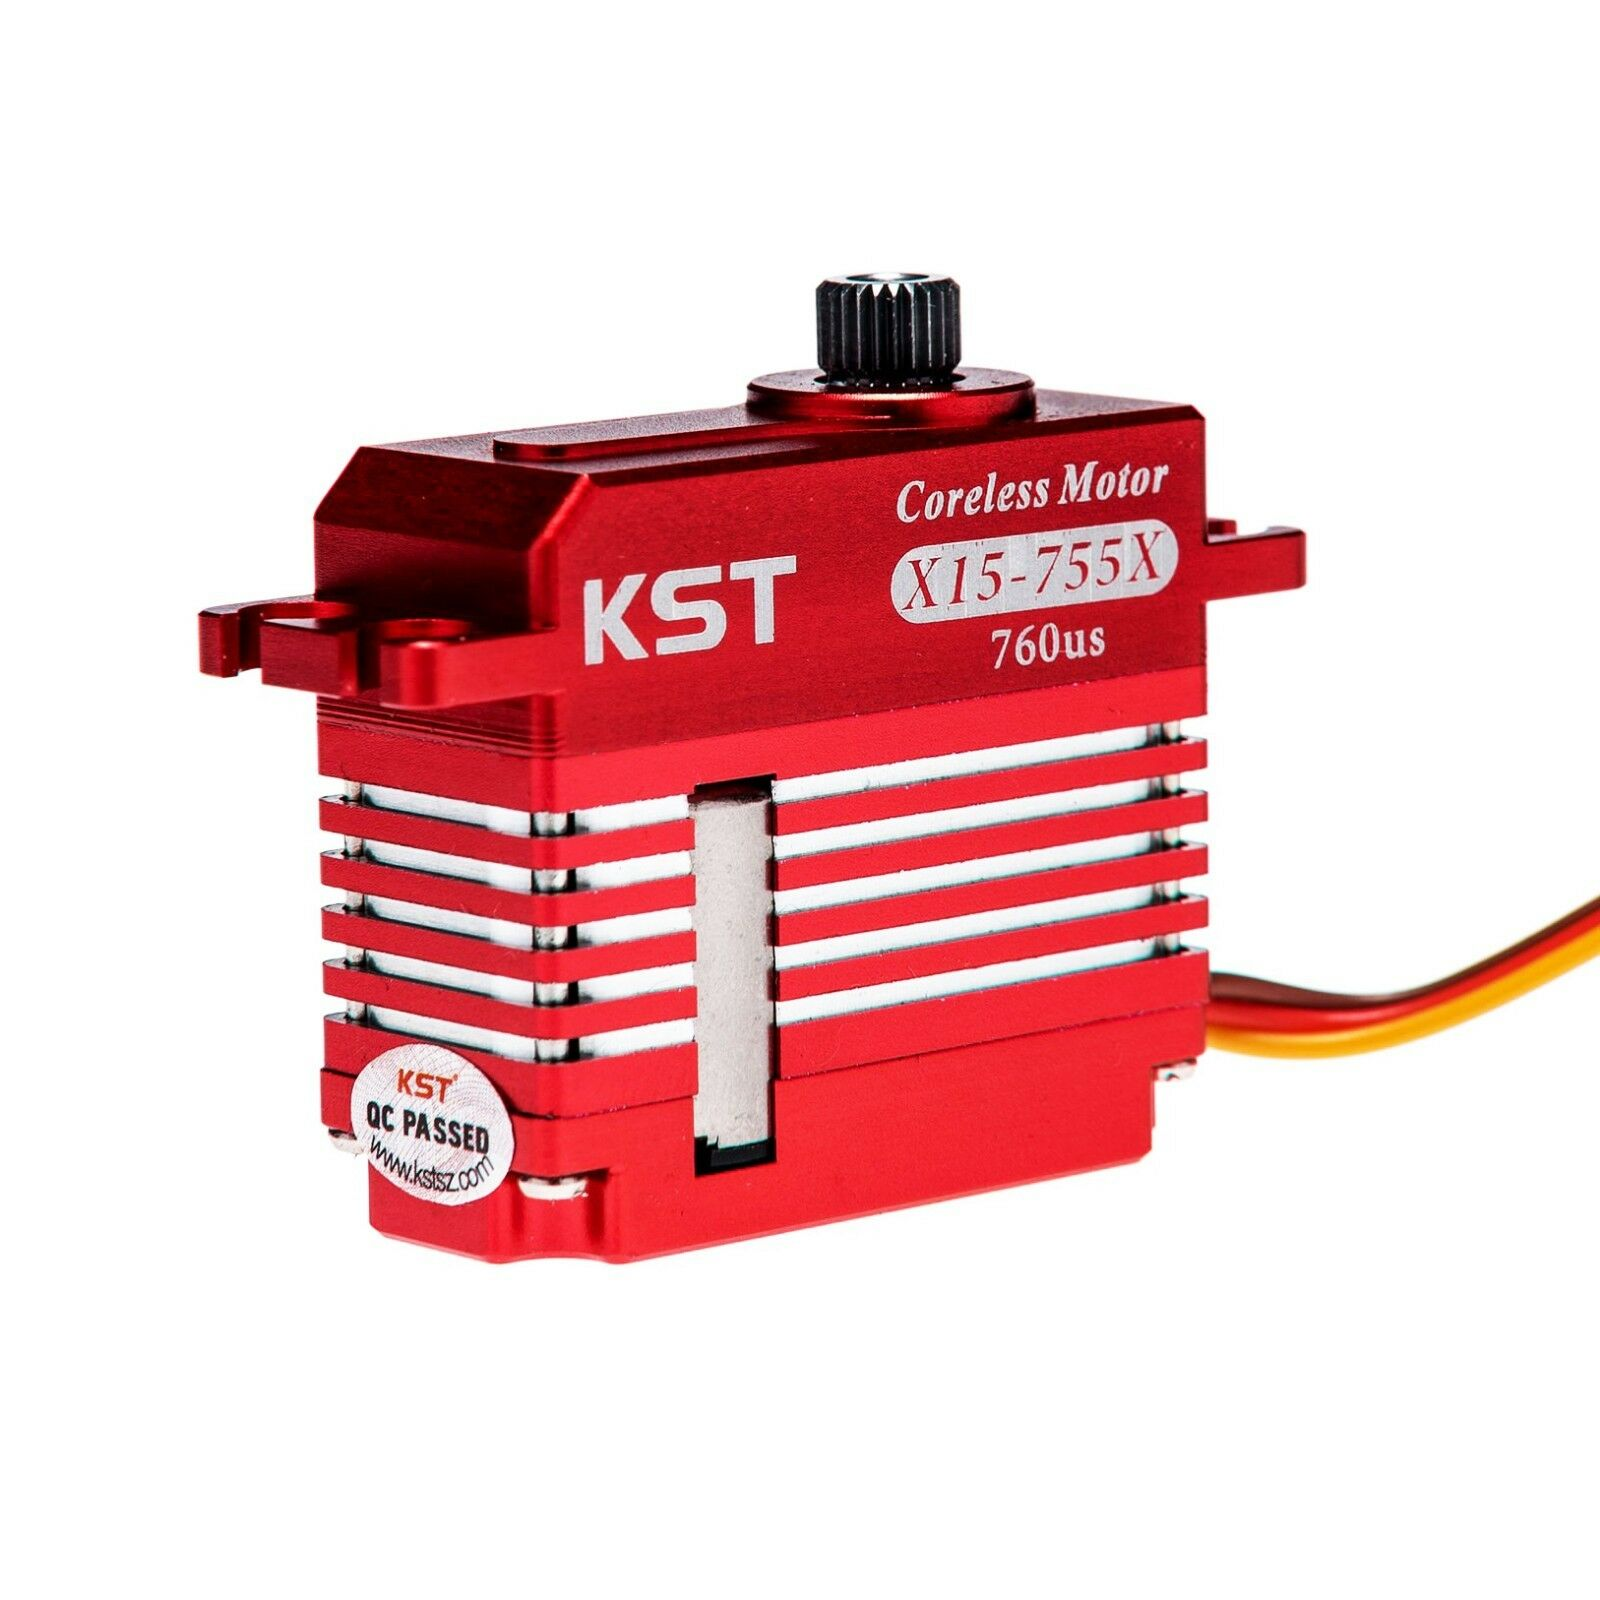 Kst x15-755x hubschrauber schwanz mini - digital - metal gear -